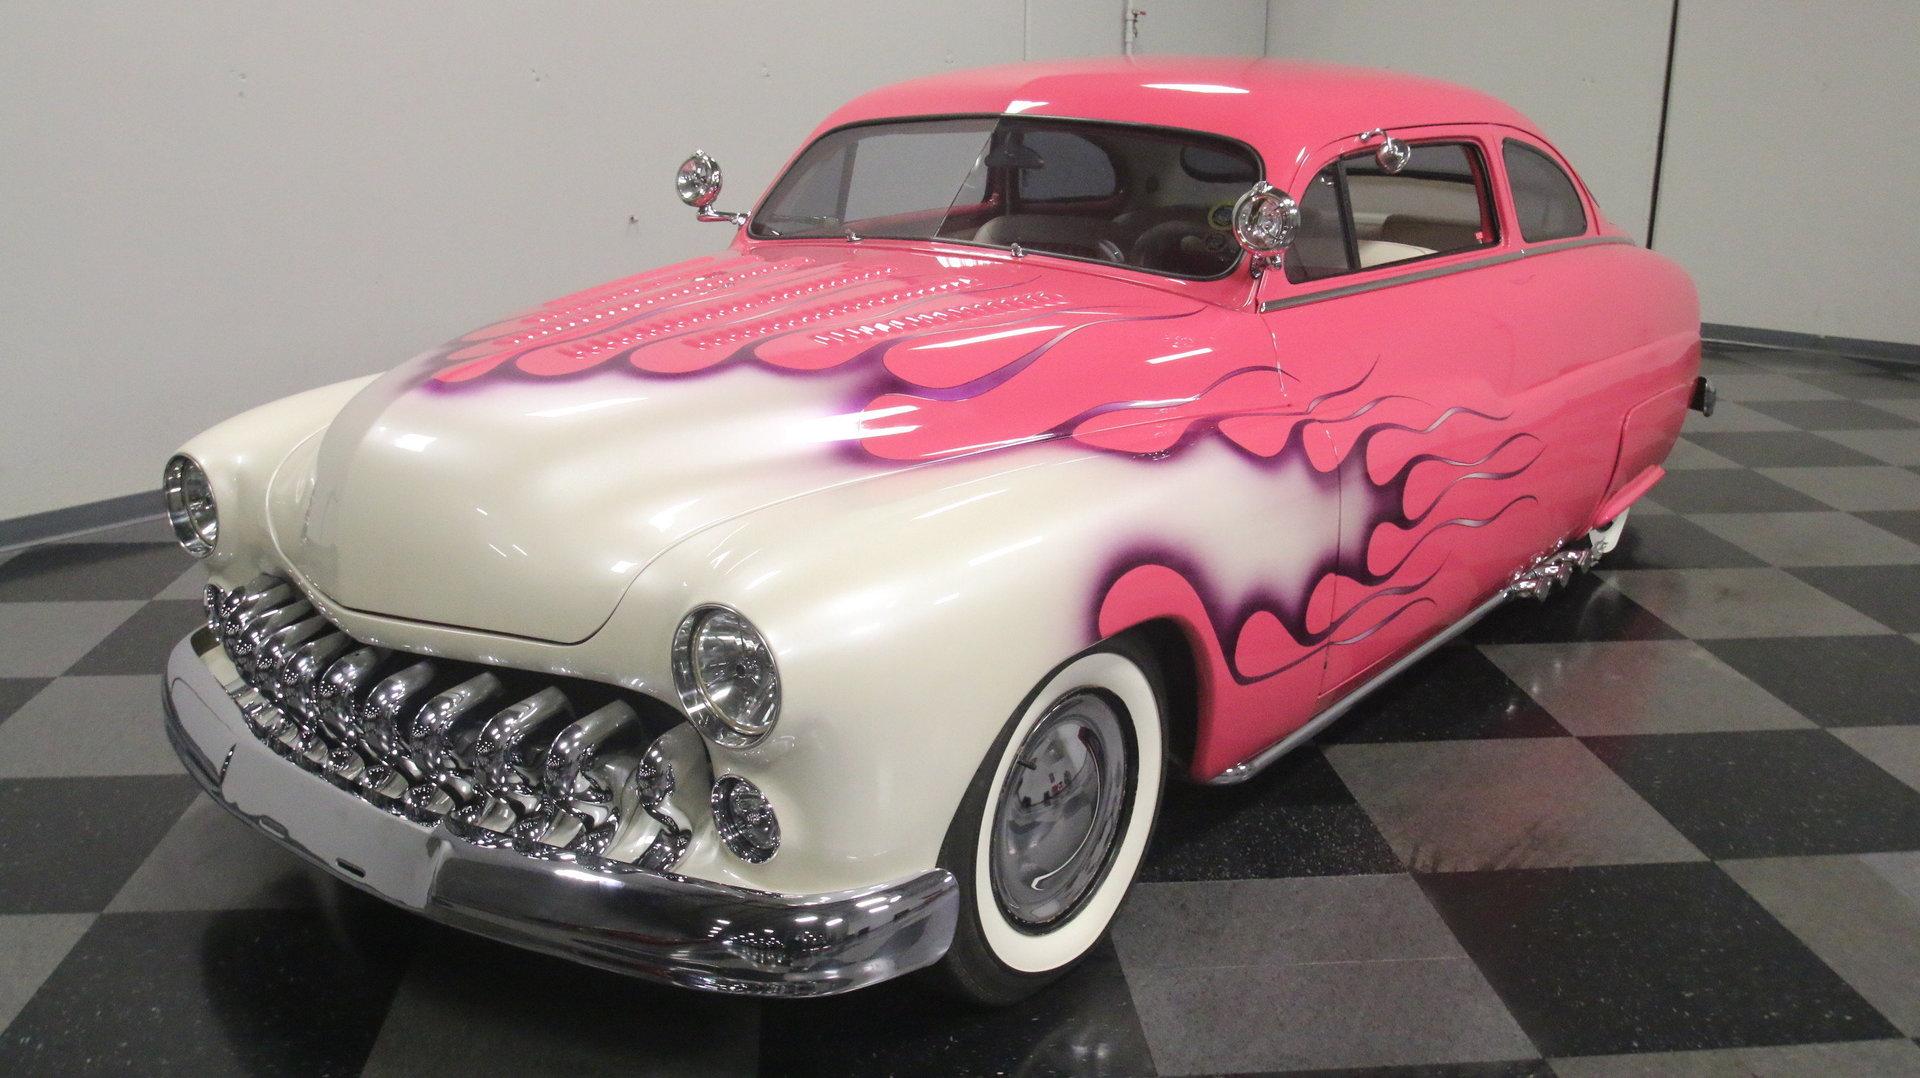 1949 Mercury Sedan For Sale: 1949 Mercury Coupe Lead Sled For Sale #94431